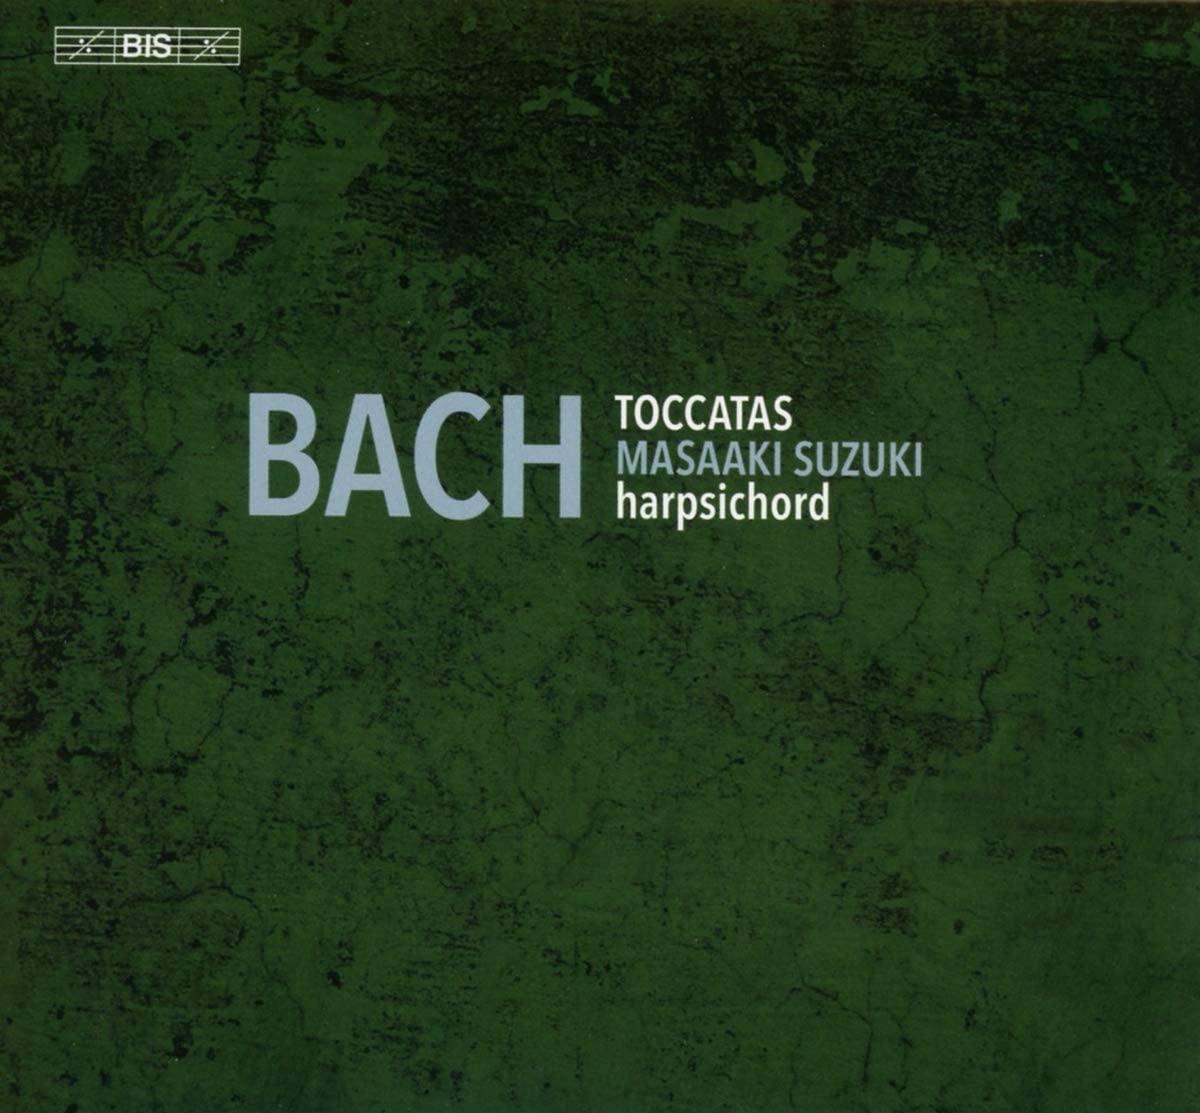 Review of JS BACH Toccatas (Masaaki Suzuki)